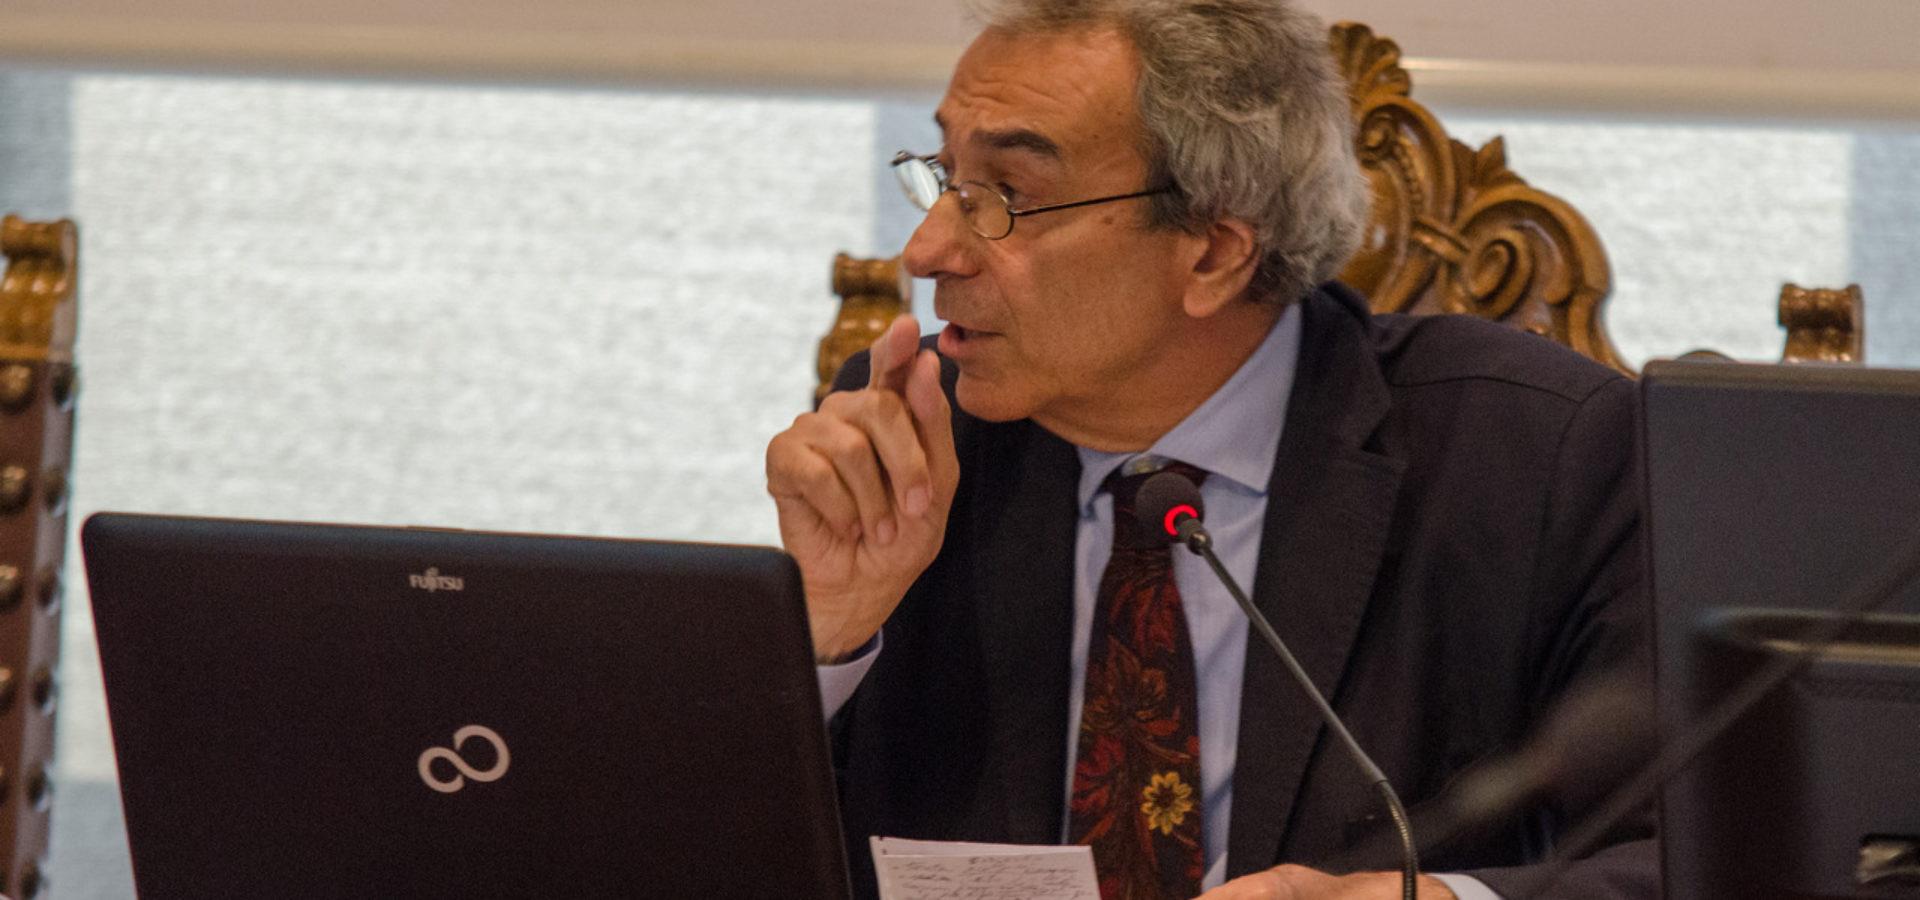 Festival 2018 – Raffaele Milani